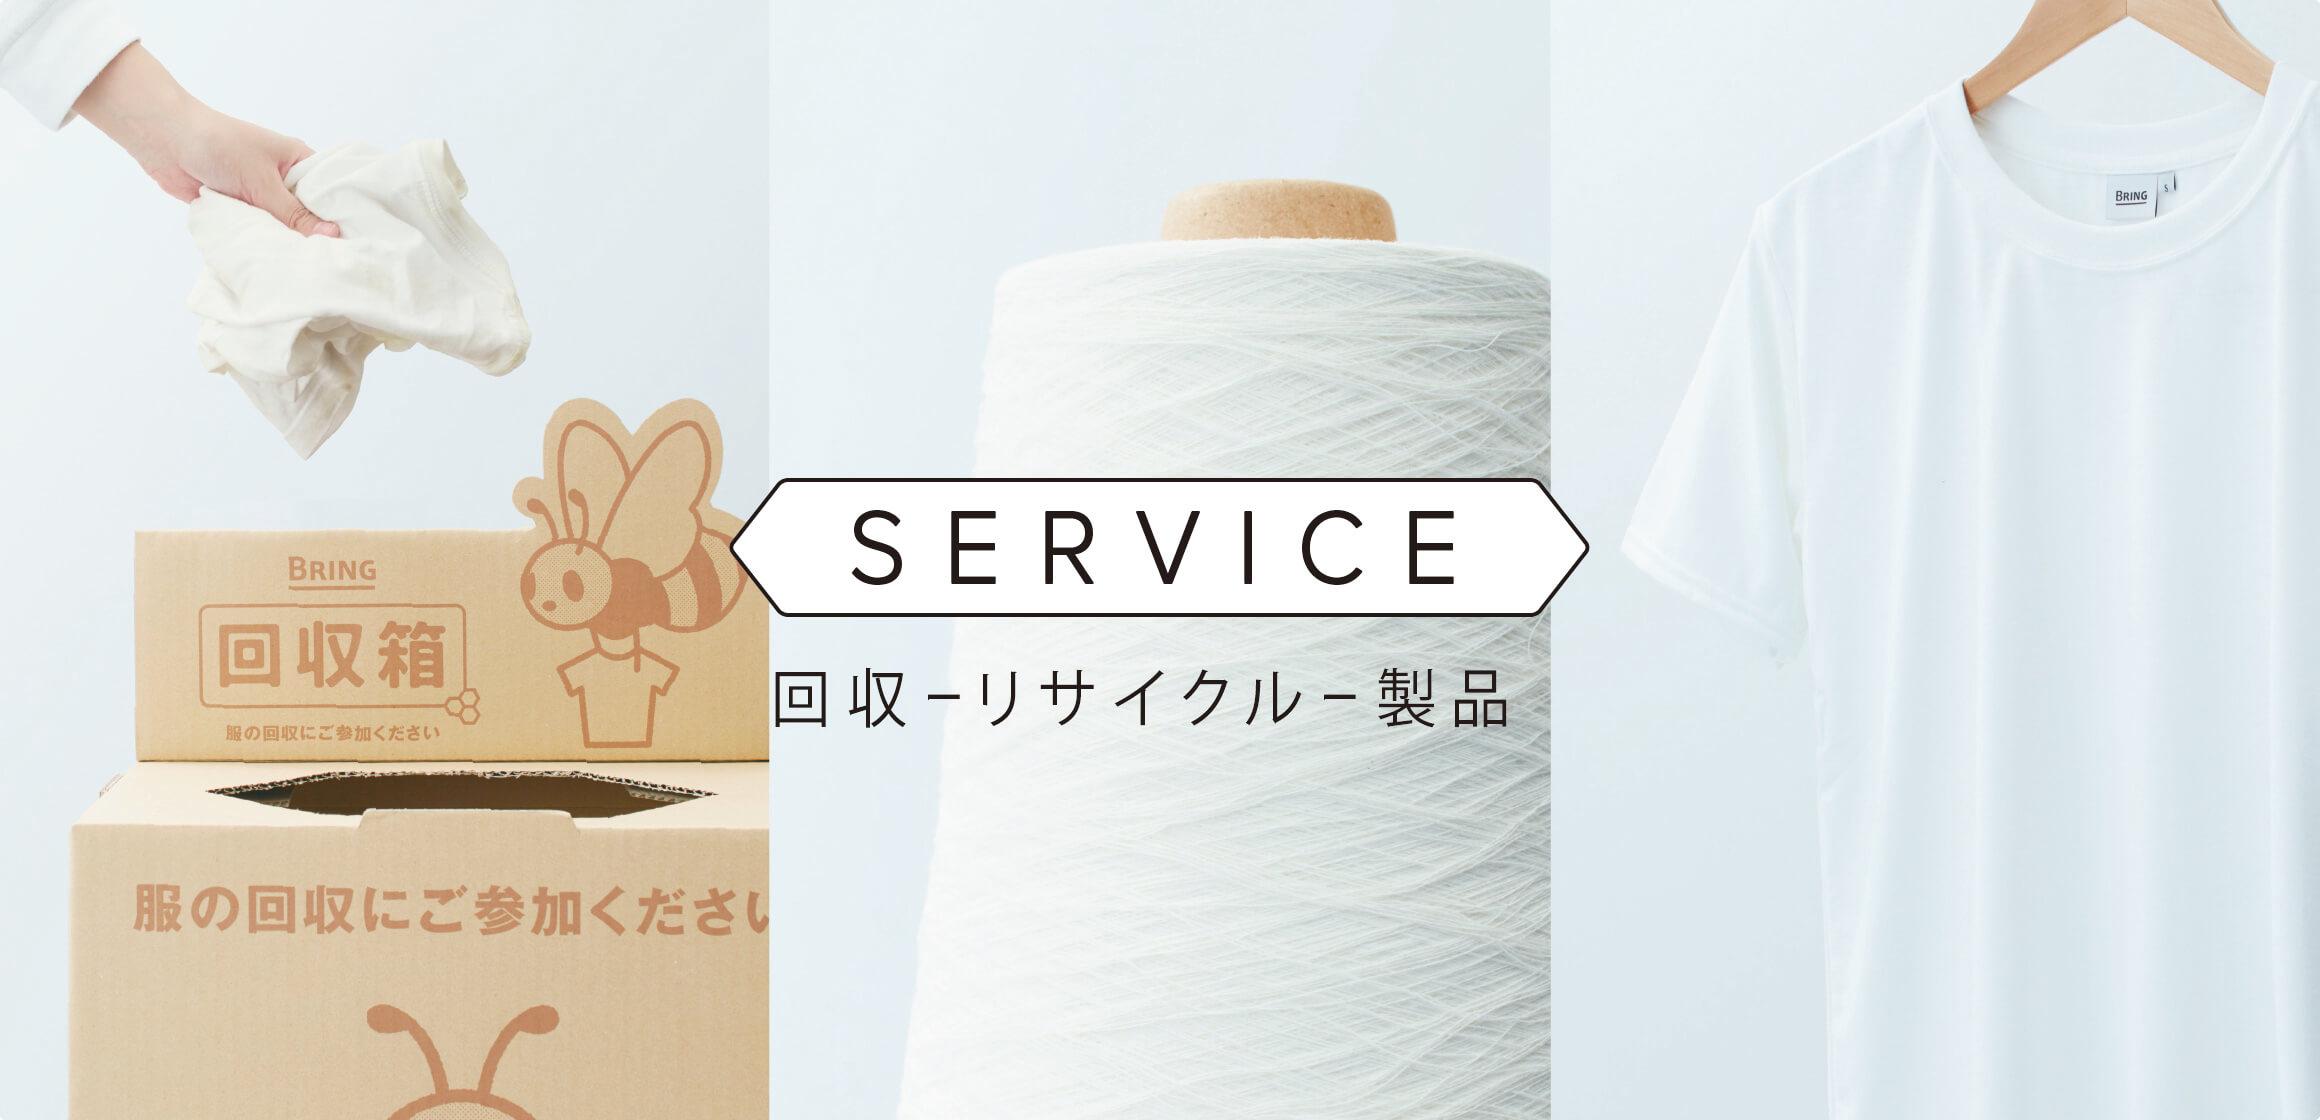 SERVICE 回収ーリサイクルー製品